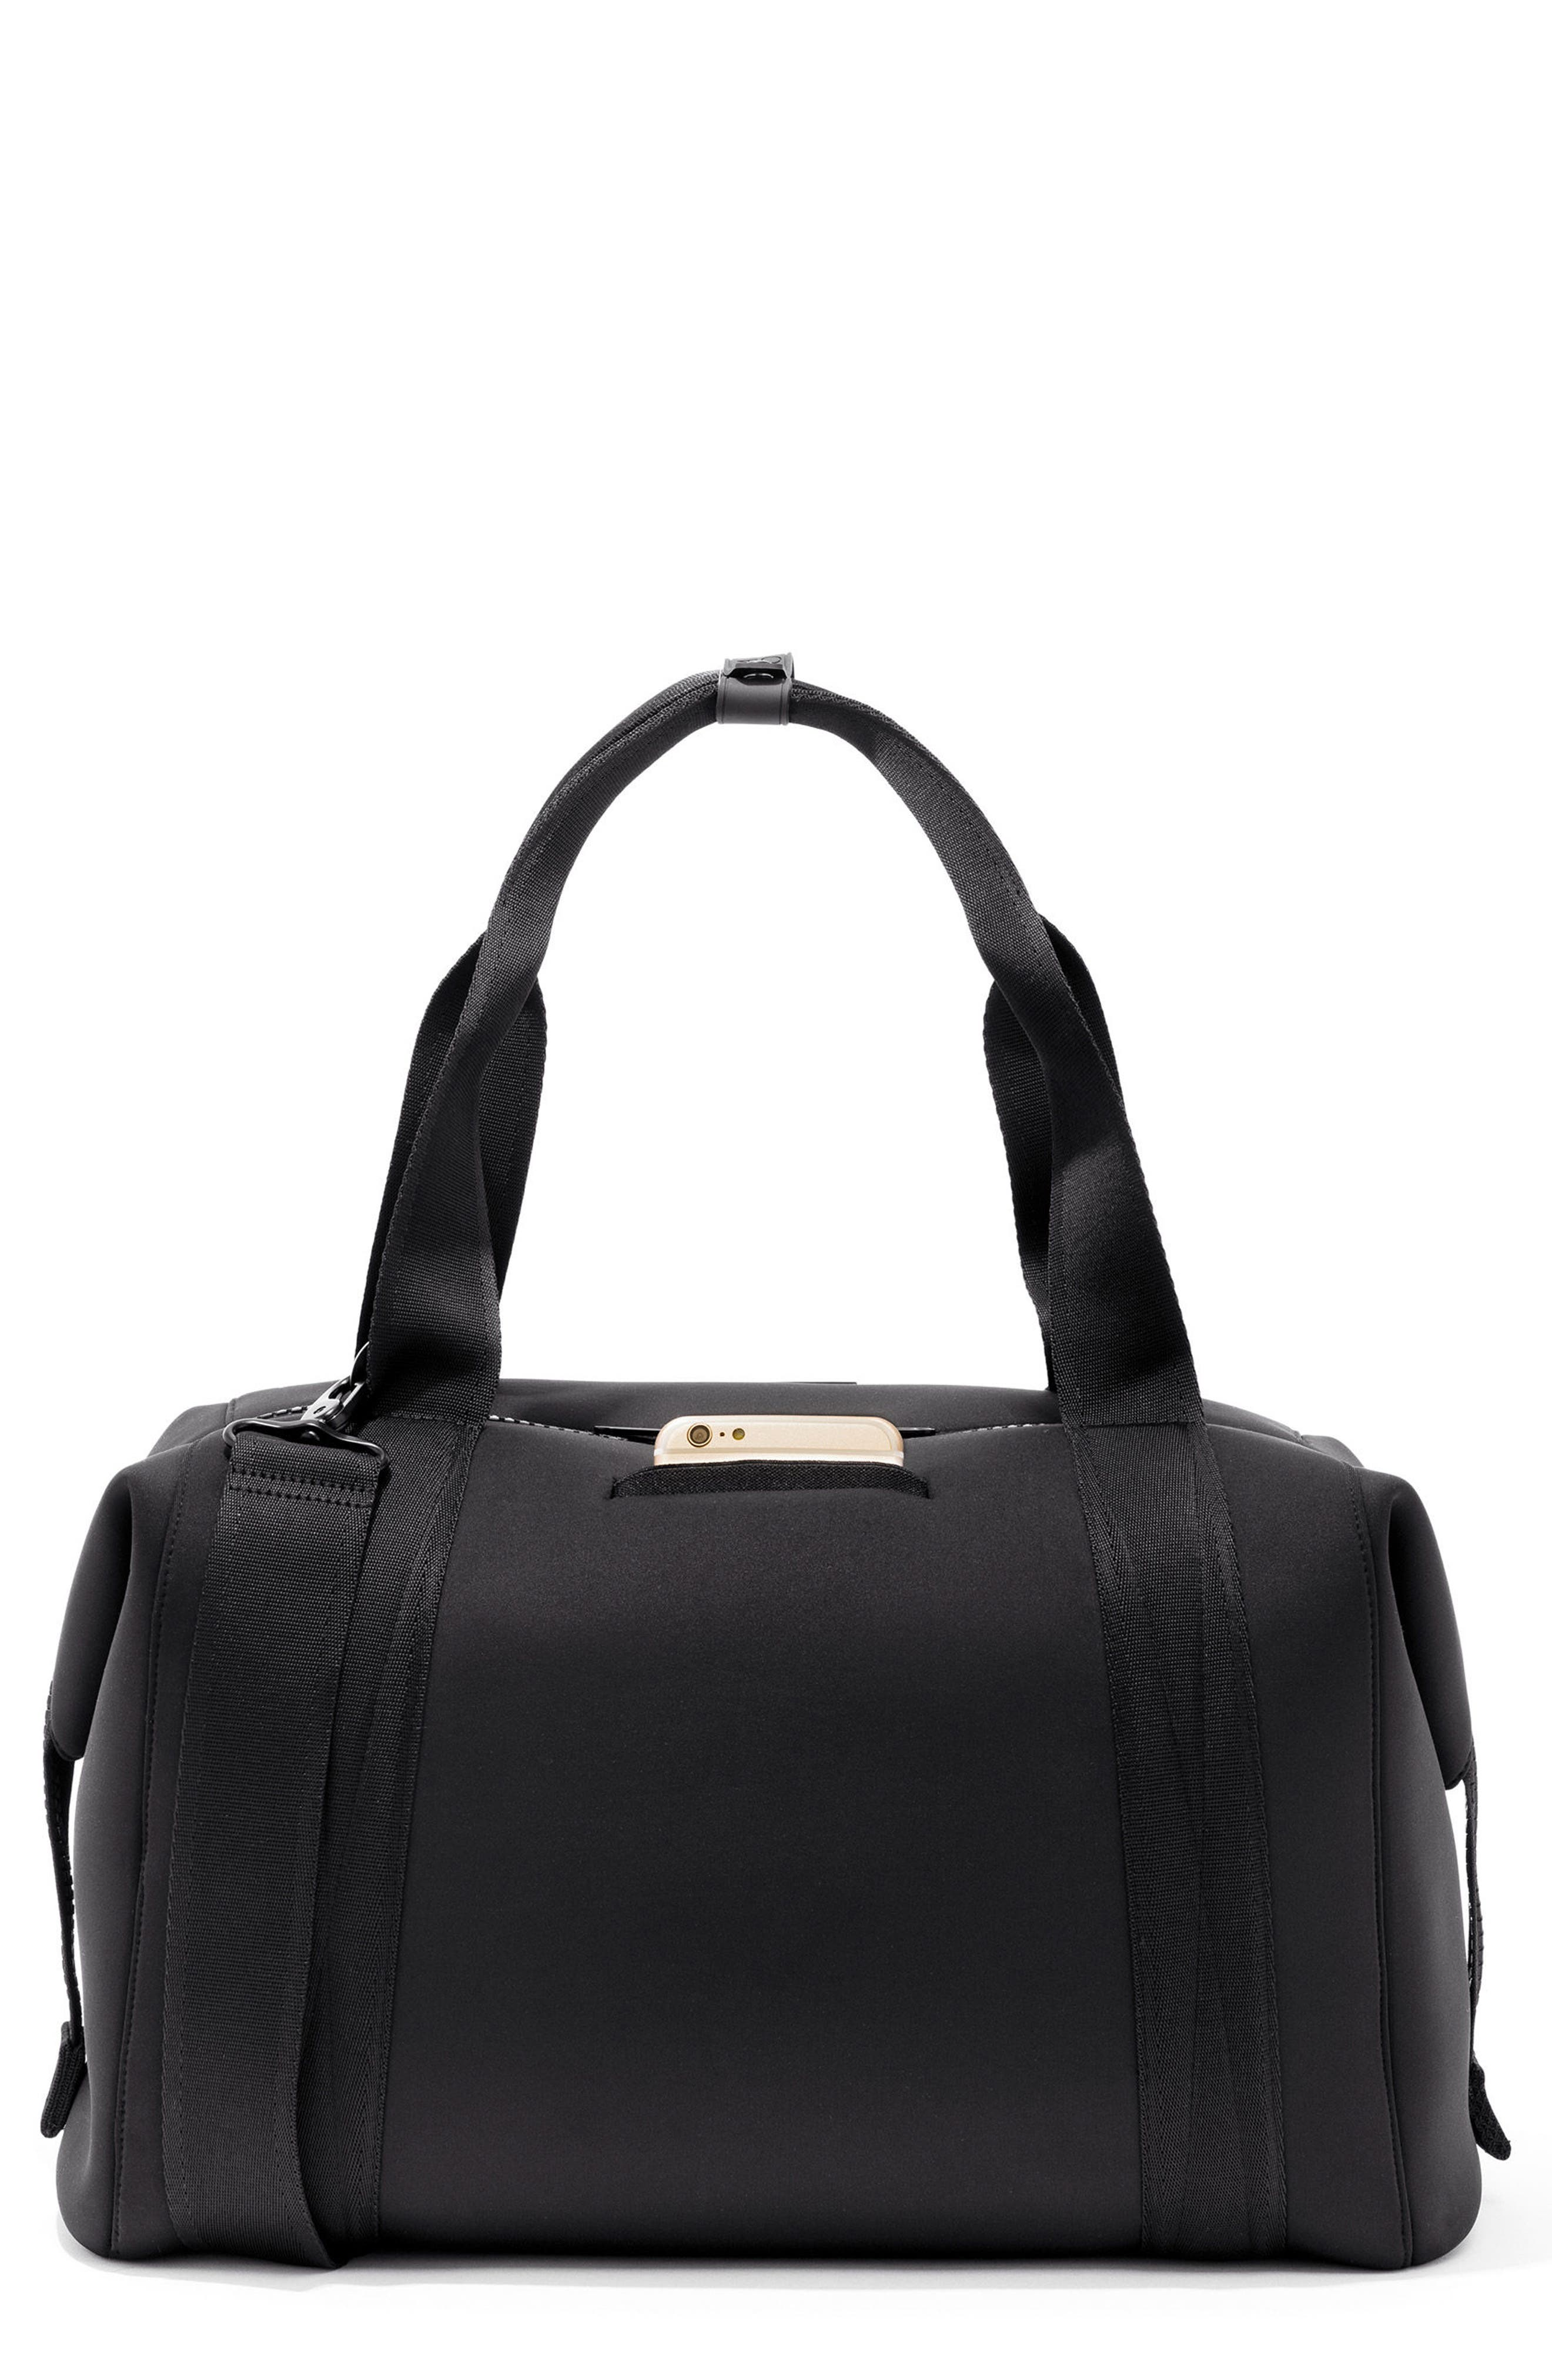 365 Large Landon Neoprene Carryall Duffel Bag,                             Main thumbnail 1, color,